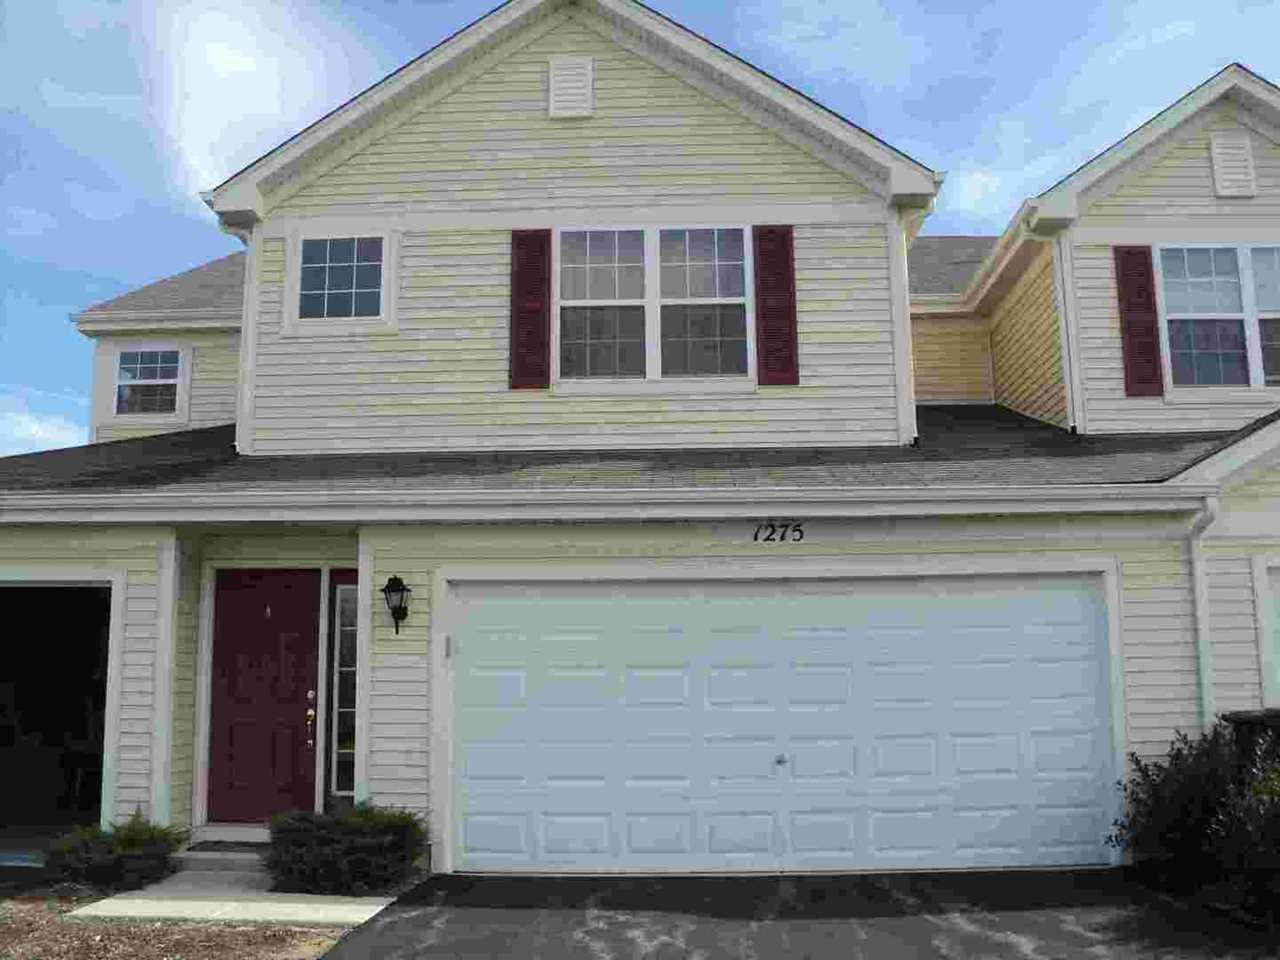 1275 Waverly Dr #3 Fox Lake, IL 60020 | MLS 10309536 Photo 1